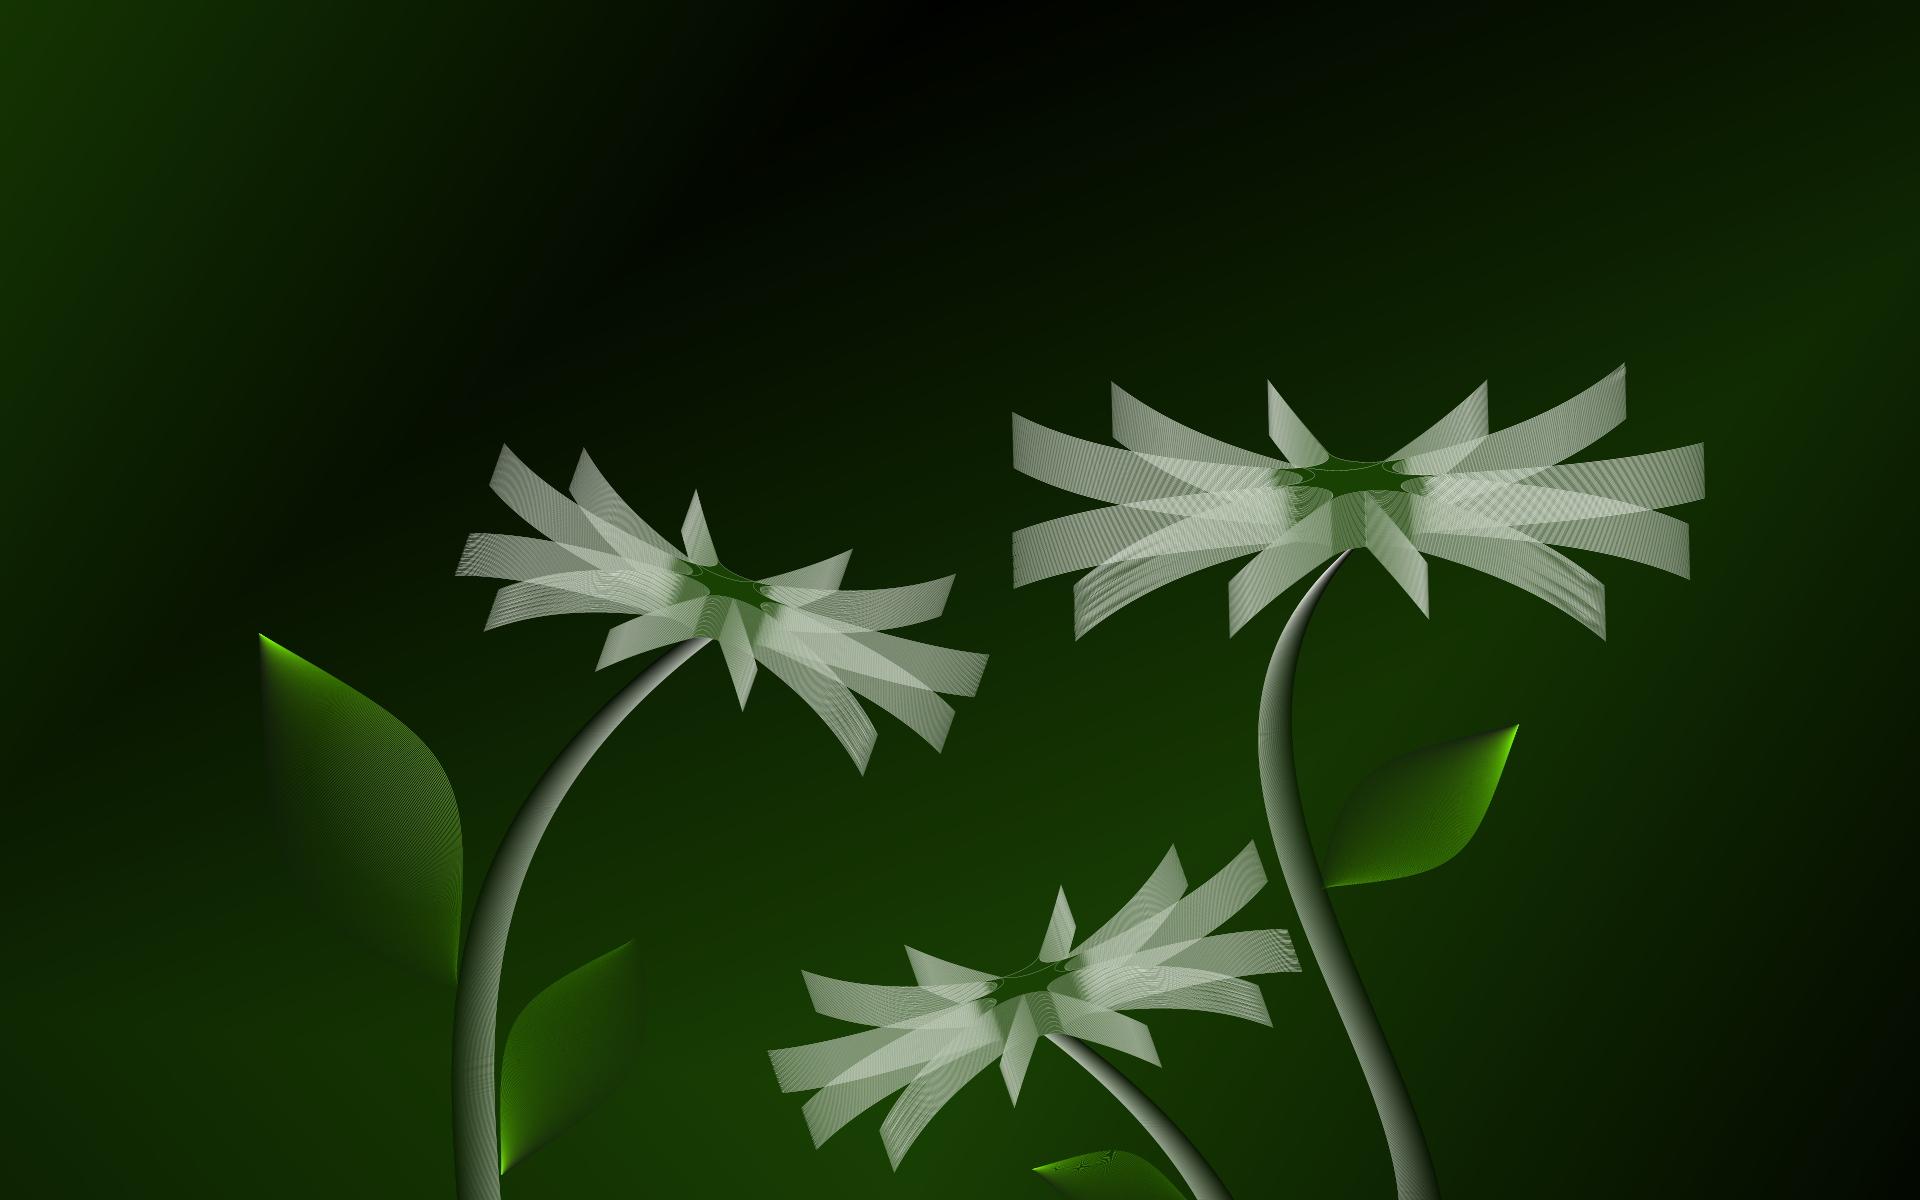 Flower Hd Wallpaper 3d Mobile , HD Wallpaper & Backgrounds